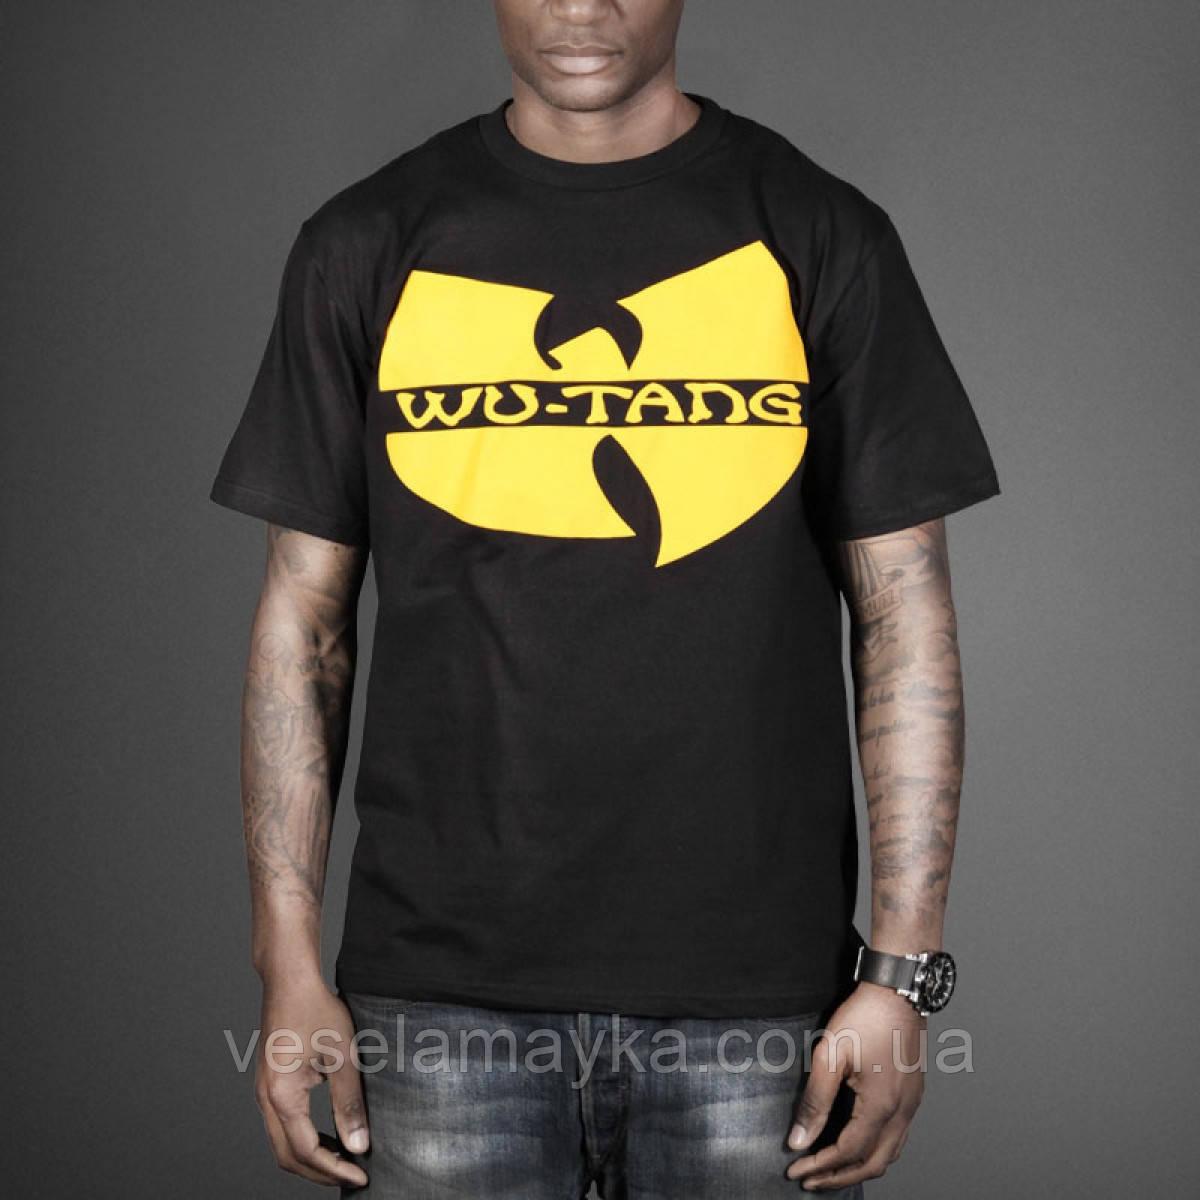 Стильна футболка Wu-Tang Clan